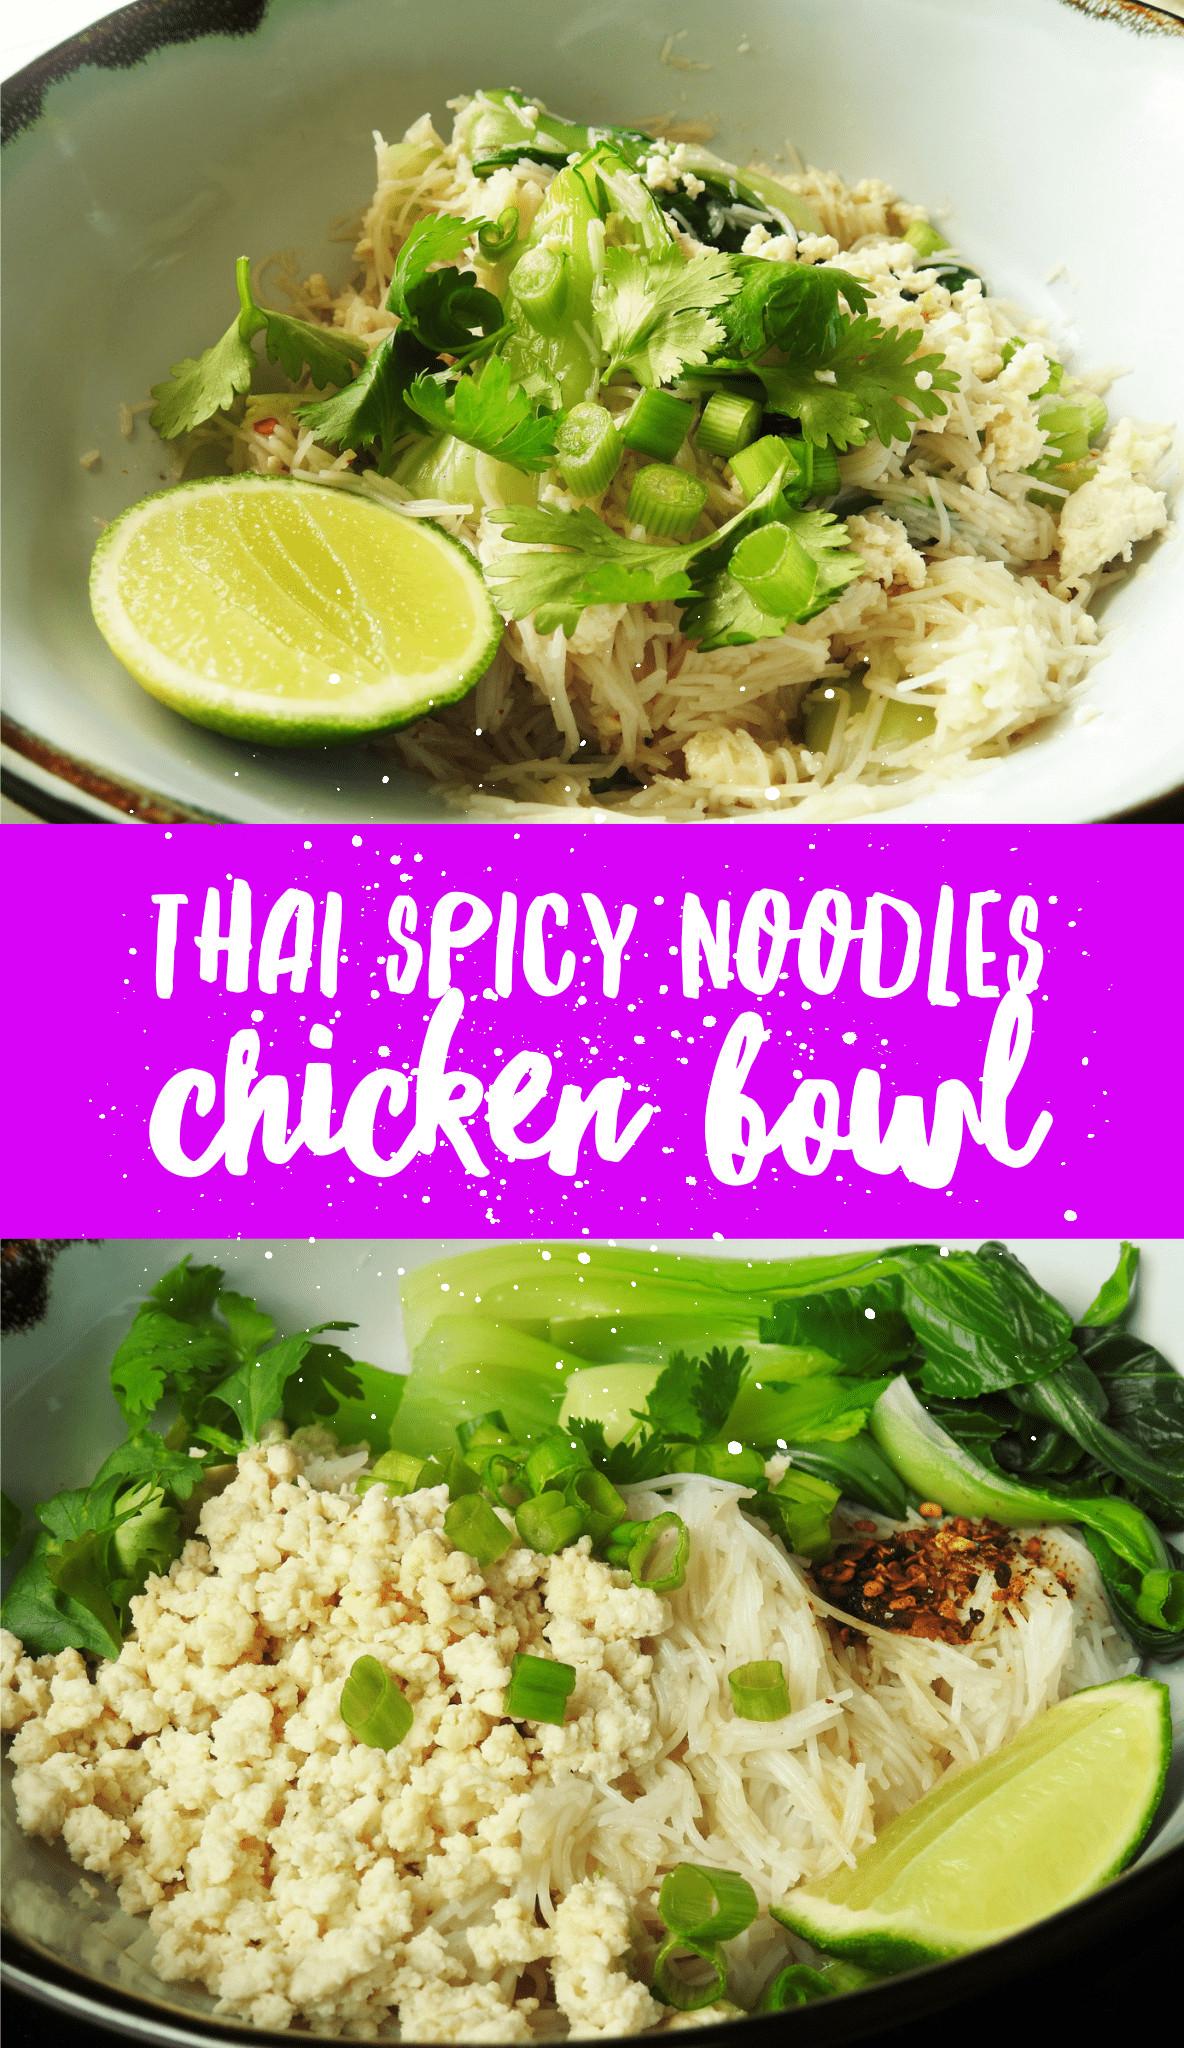 Healthy Thai Food Recipes  Thai Spicy Noodles Chicken Bowl Healthy Thai Recipes